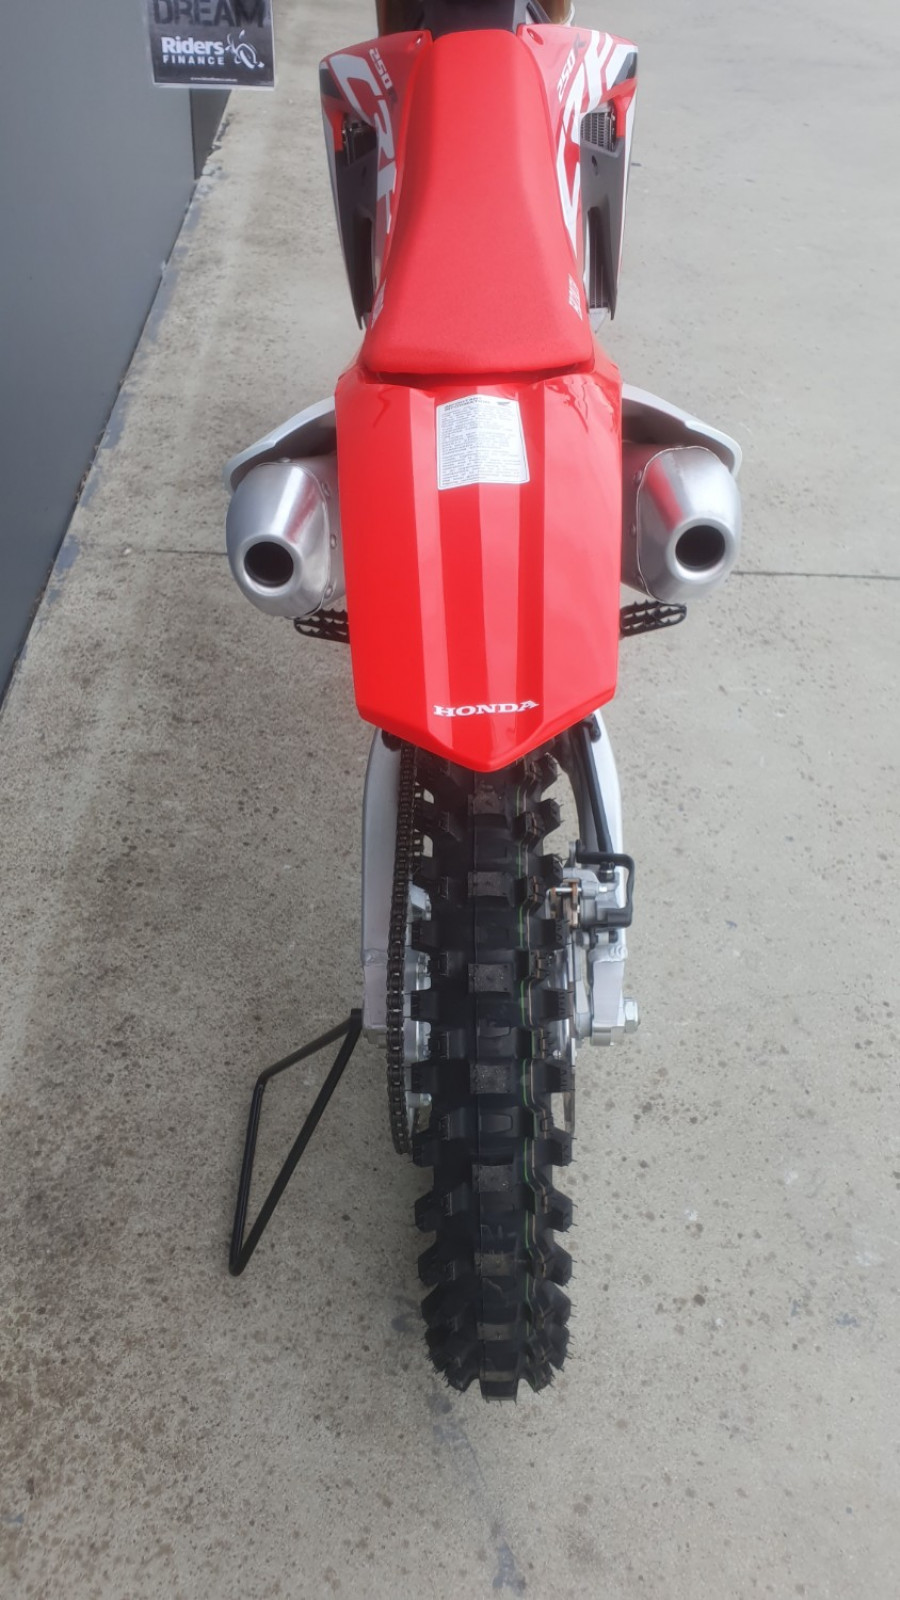 2020 Honda CRF250R TEMP 2020 CRF250R Motorcycle Image 11